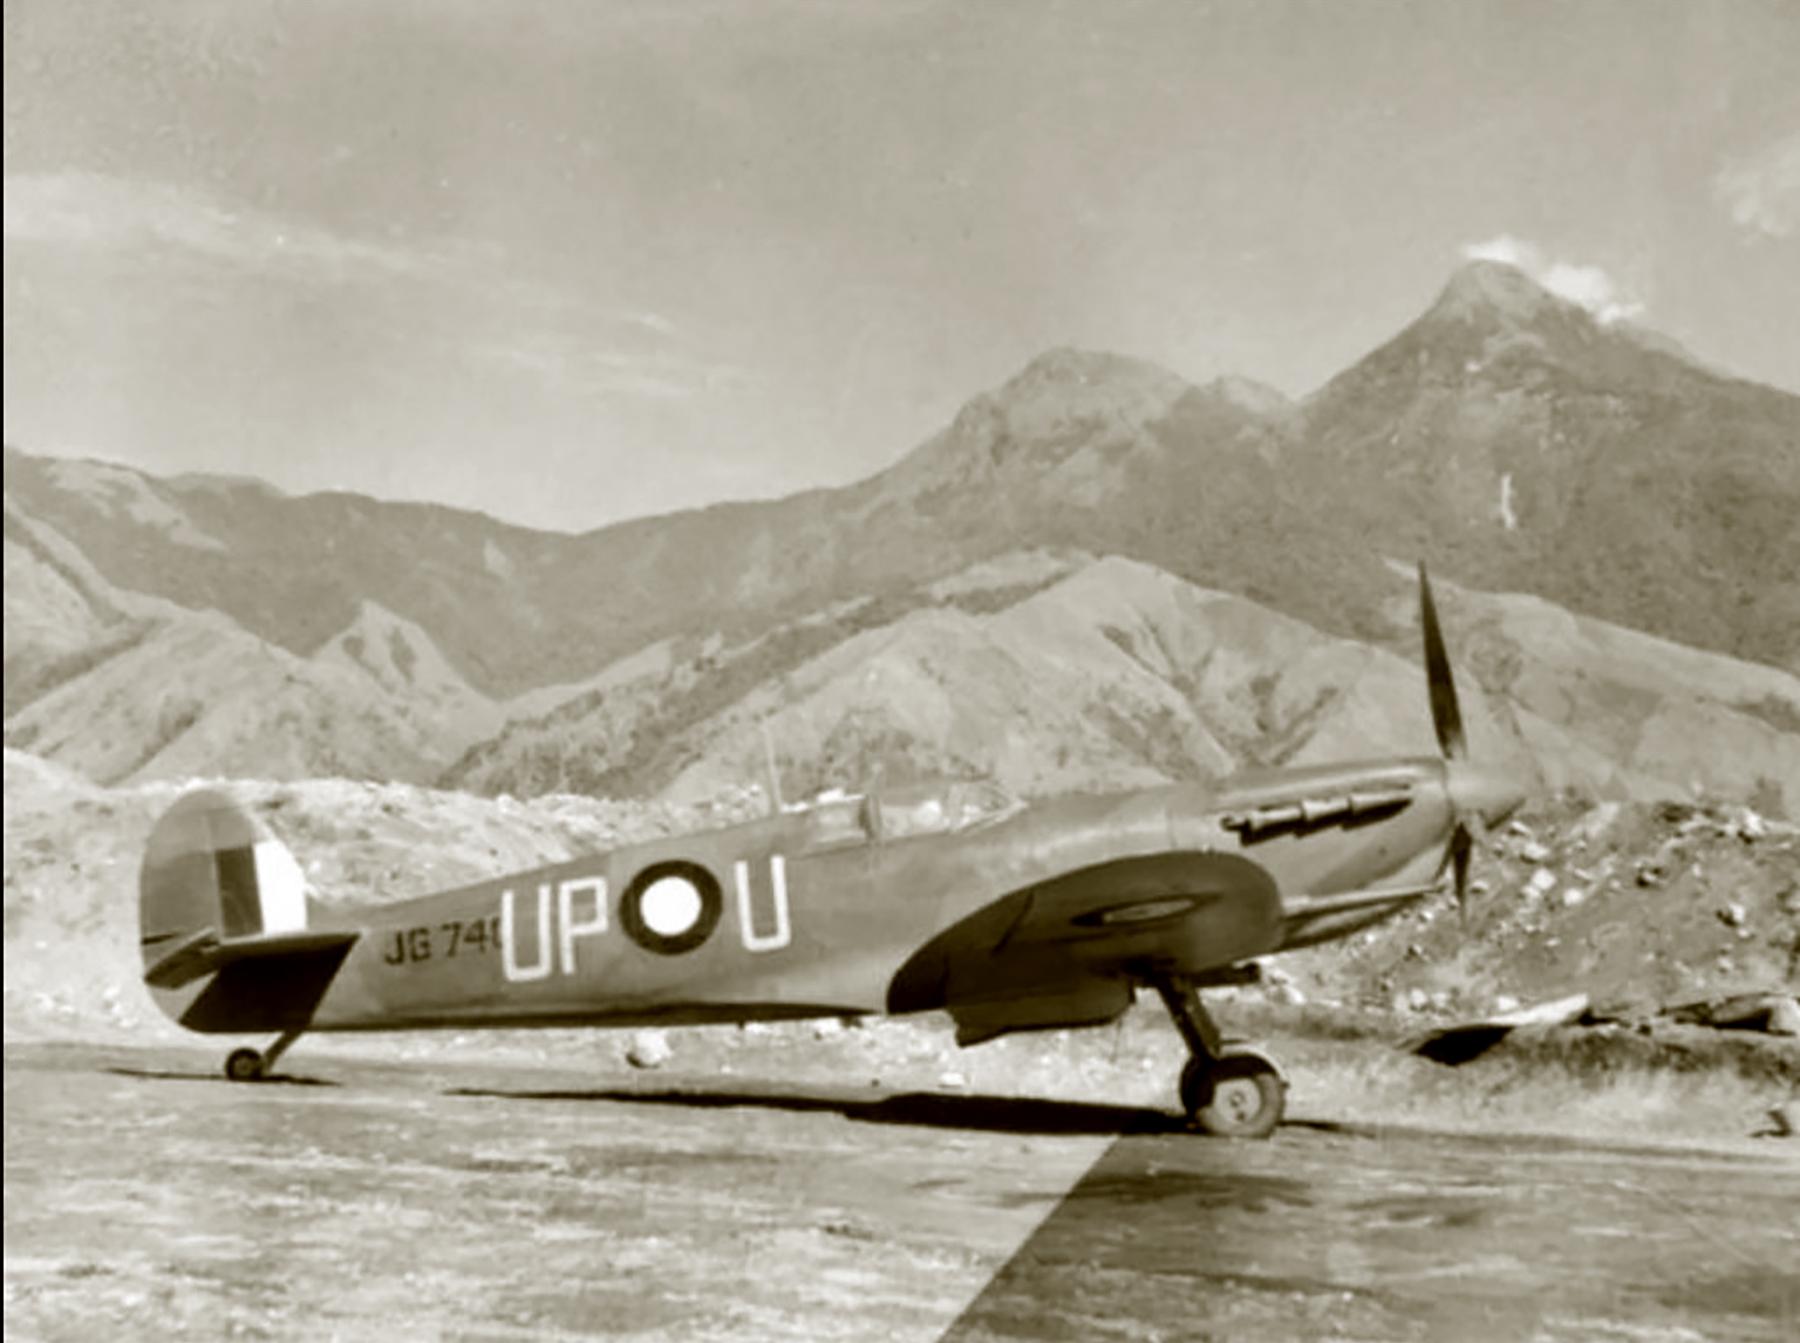 Spitfire Vc RAAF 79Sqn UPU JG740 July 1944 AWM